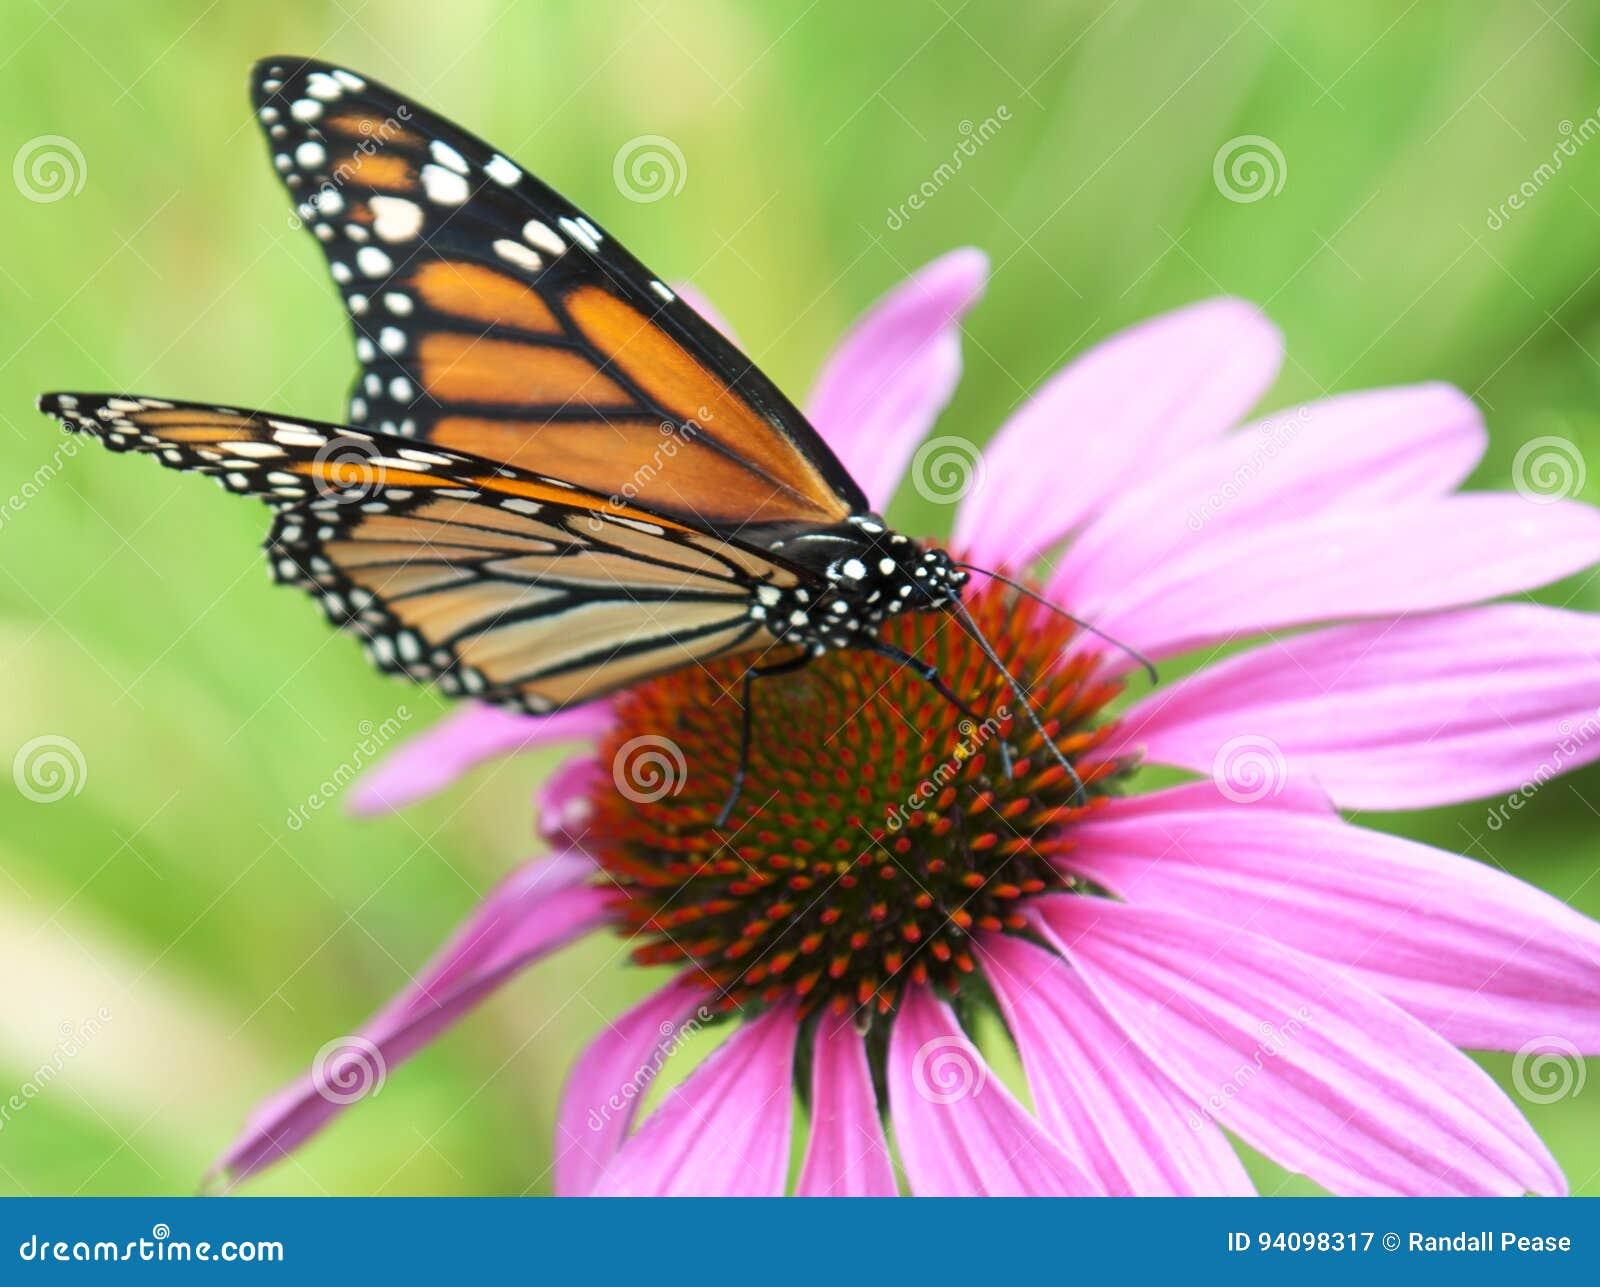 Бабочка монарха на цветке эхинацеи